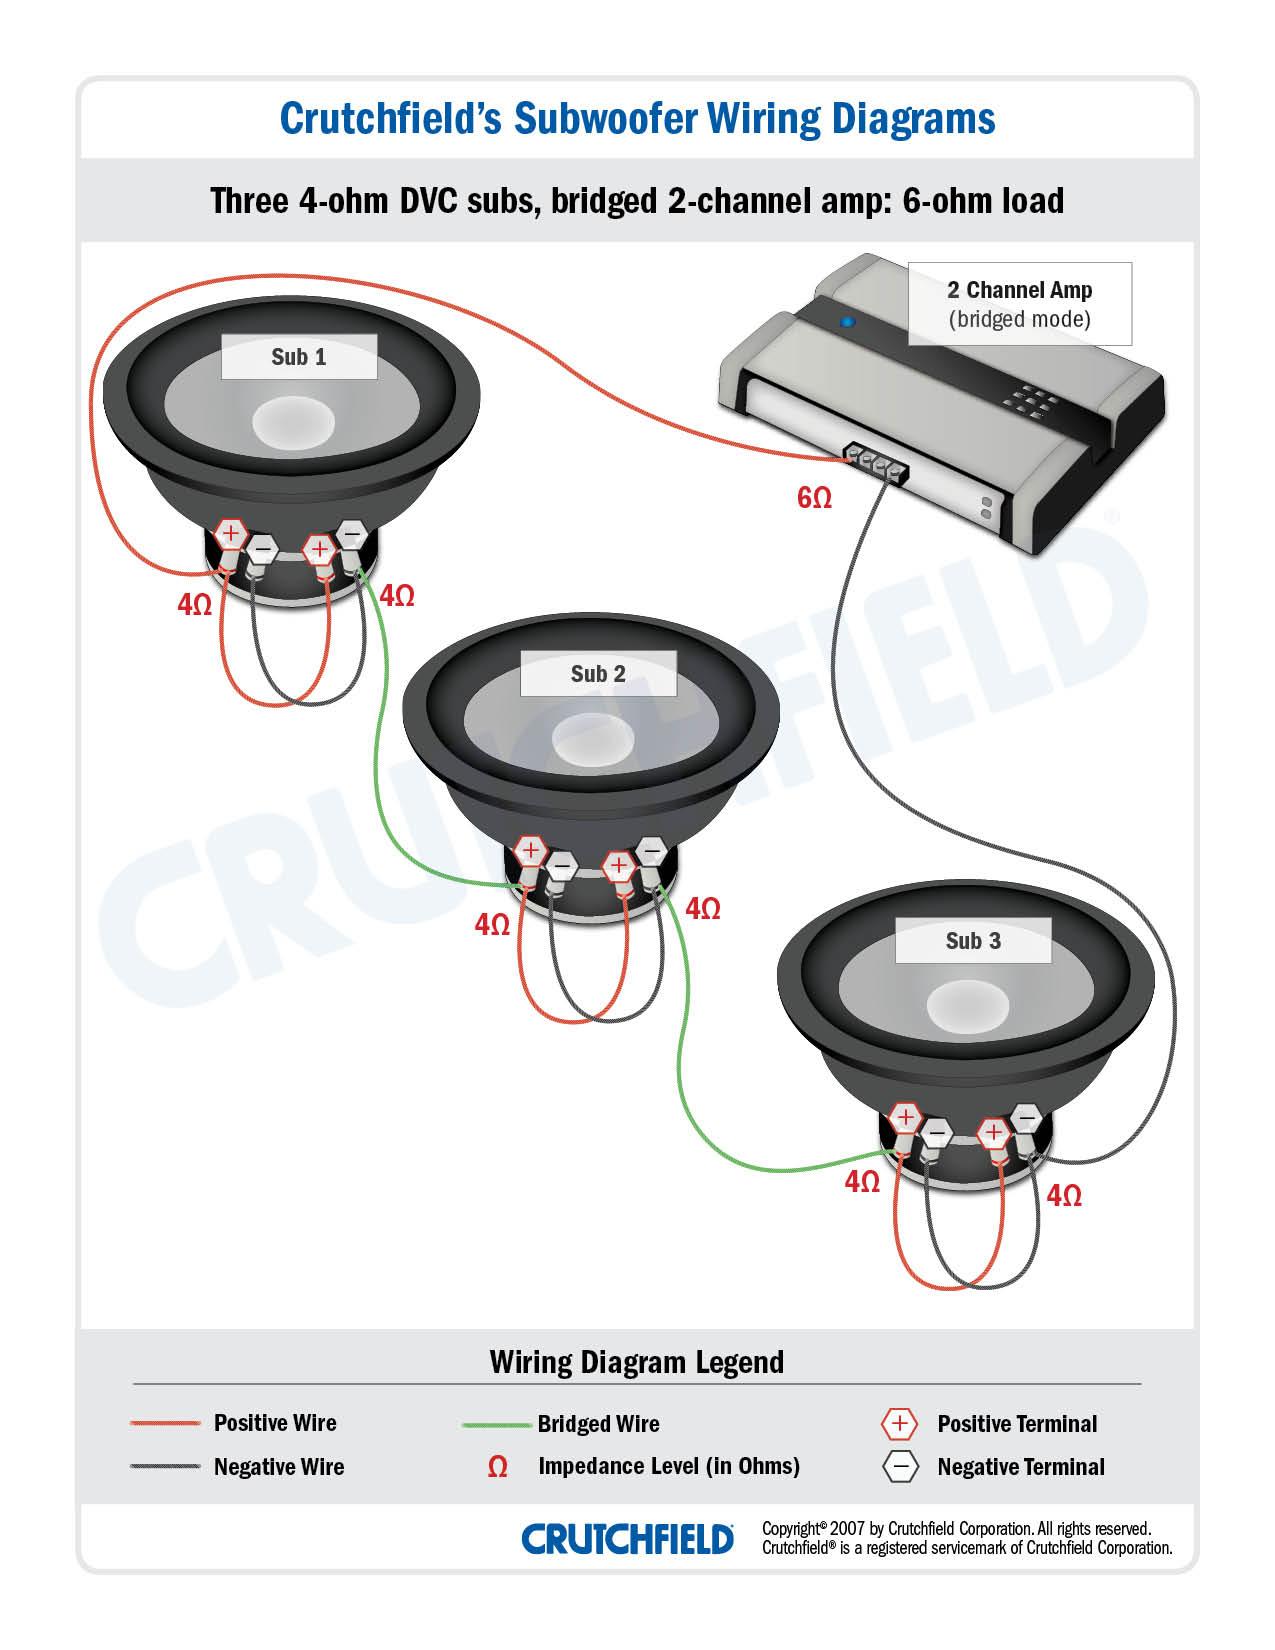 Jl Audio 500 1 Wiring | Wiring Diagram - Jl Audio 500 1 Wiring Diagram